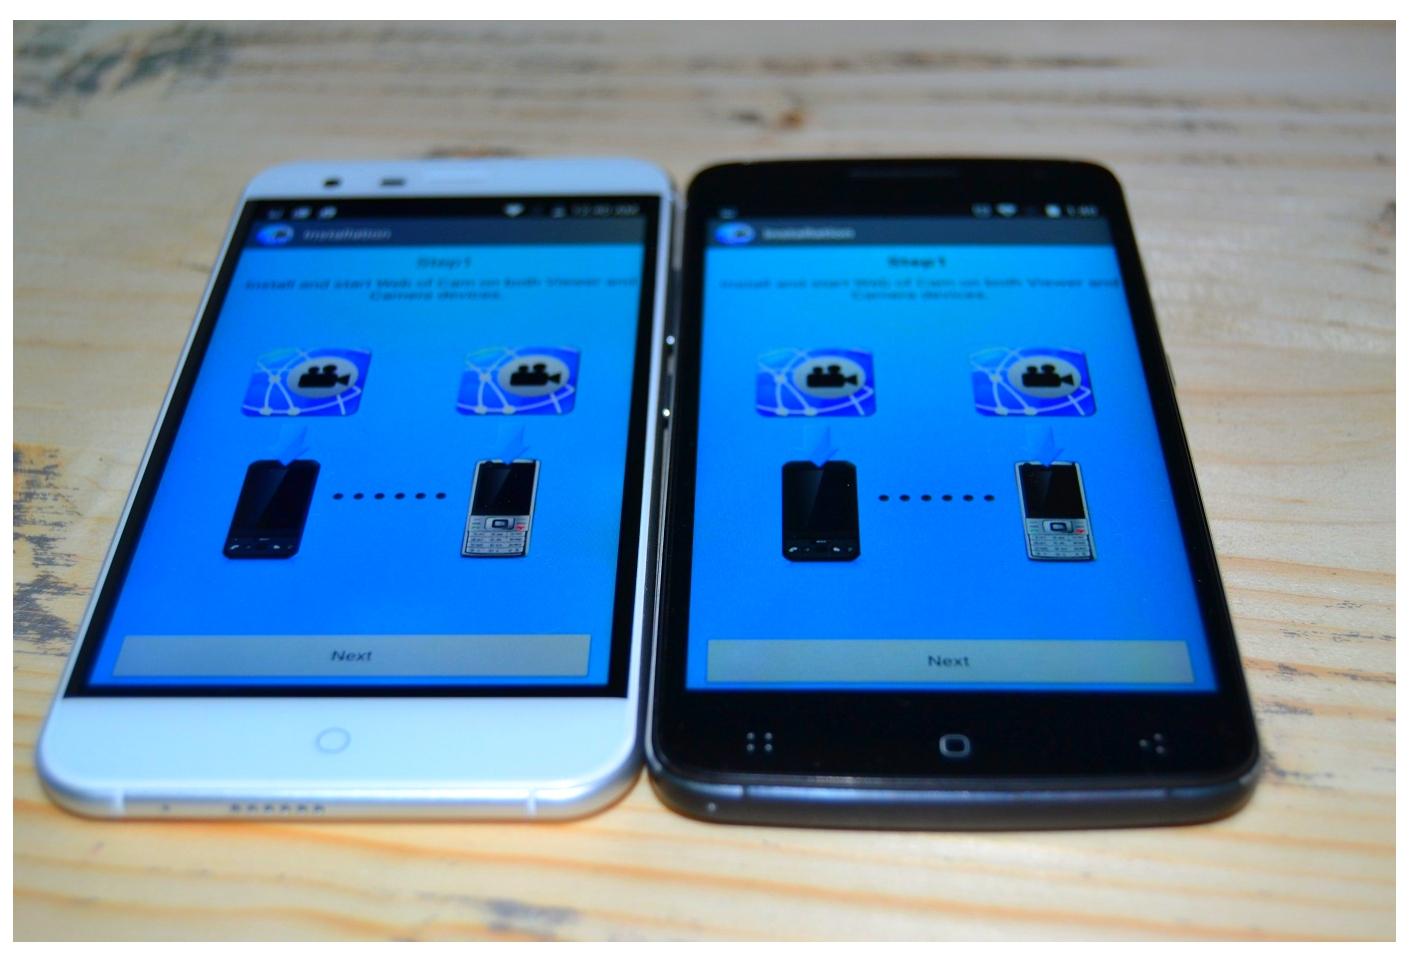 DSC_0088 Transforma telefonul in camera video de supraveghere, Walkie Talkie sau webcam!